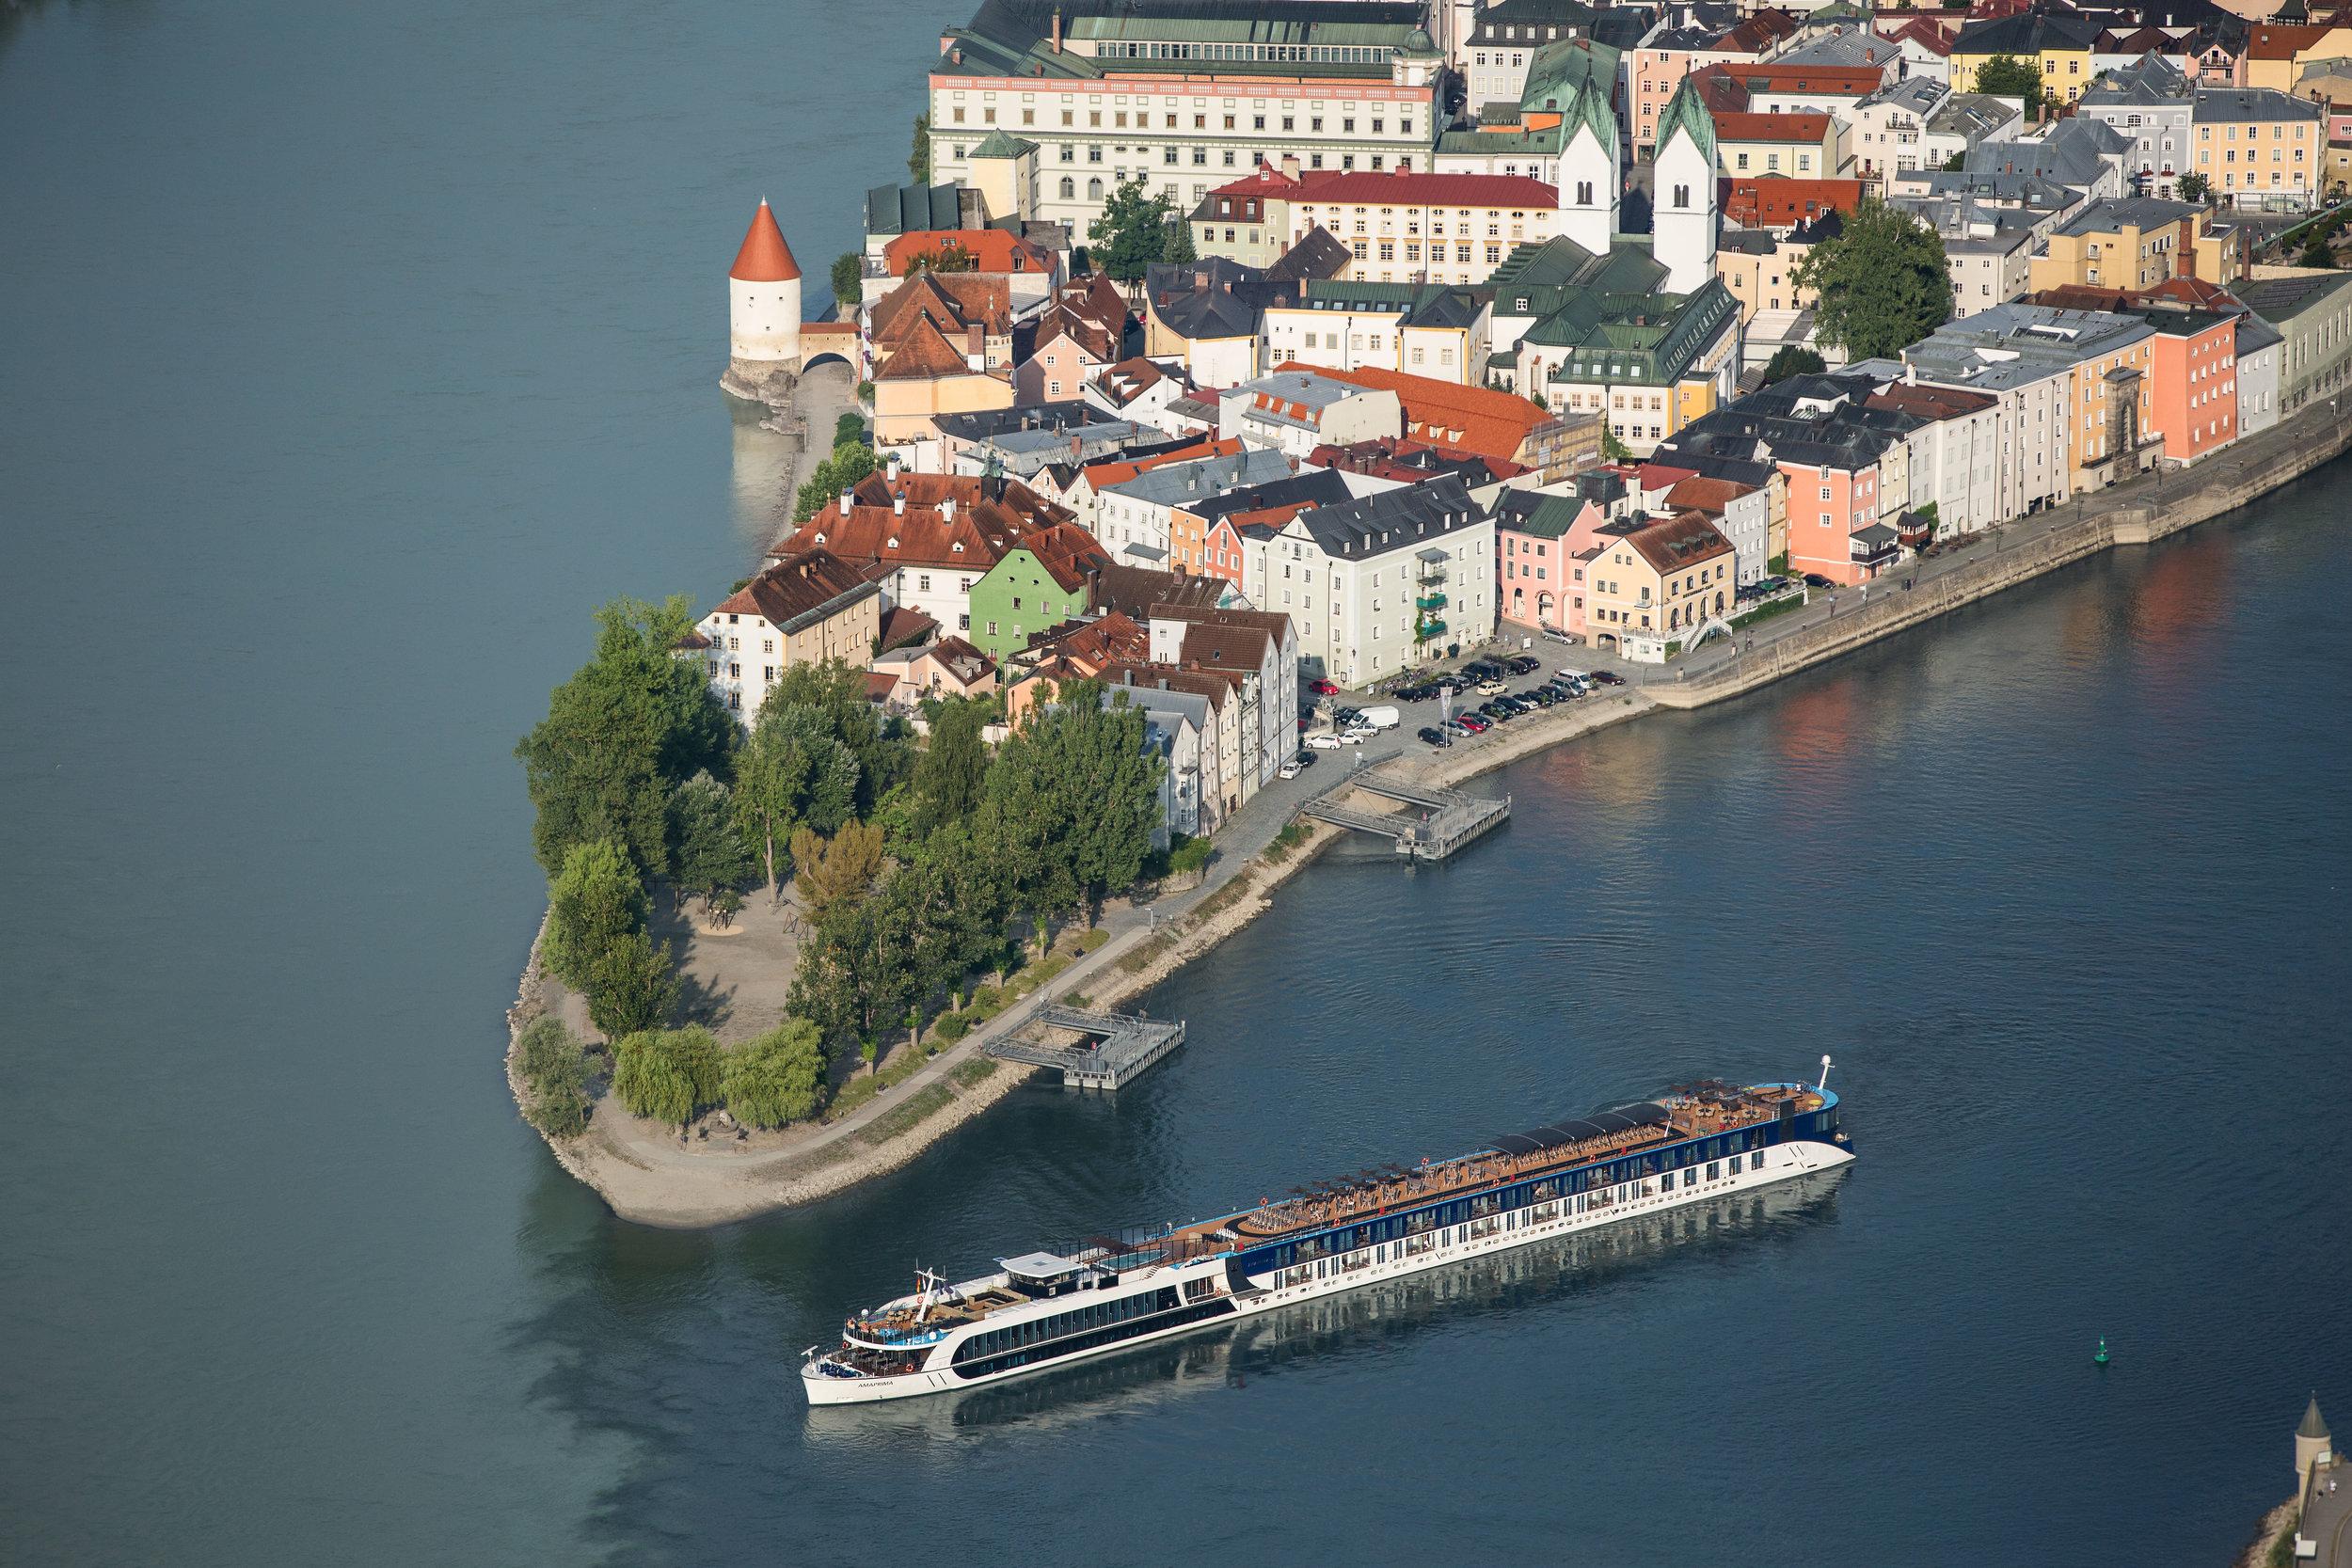 AmaPrima_Aerial_Passau_Landscape (2).jpg